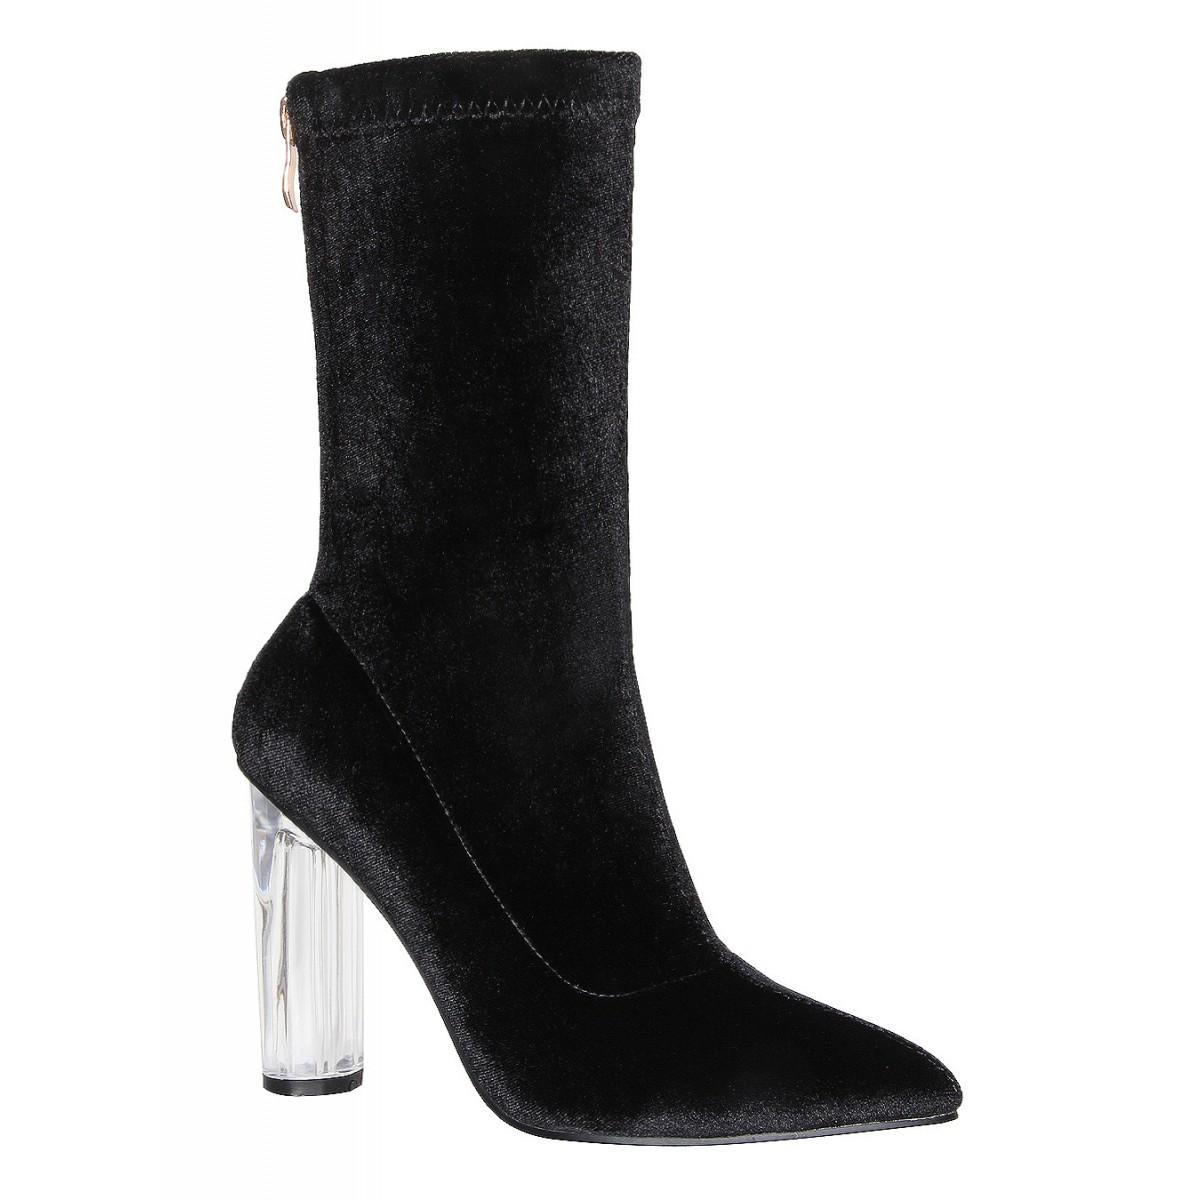 8a58878d50c Amina Black Velvet Perspex Heel Ankle Boots : Simmi Shoes